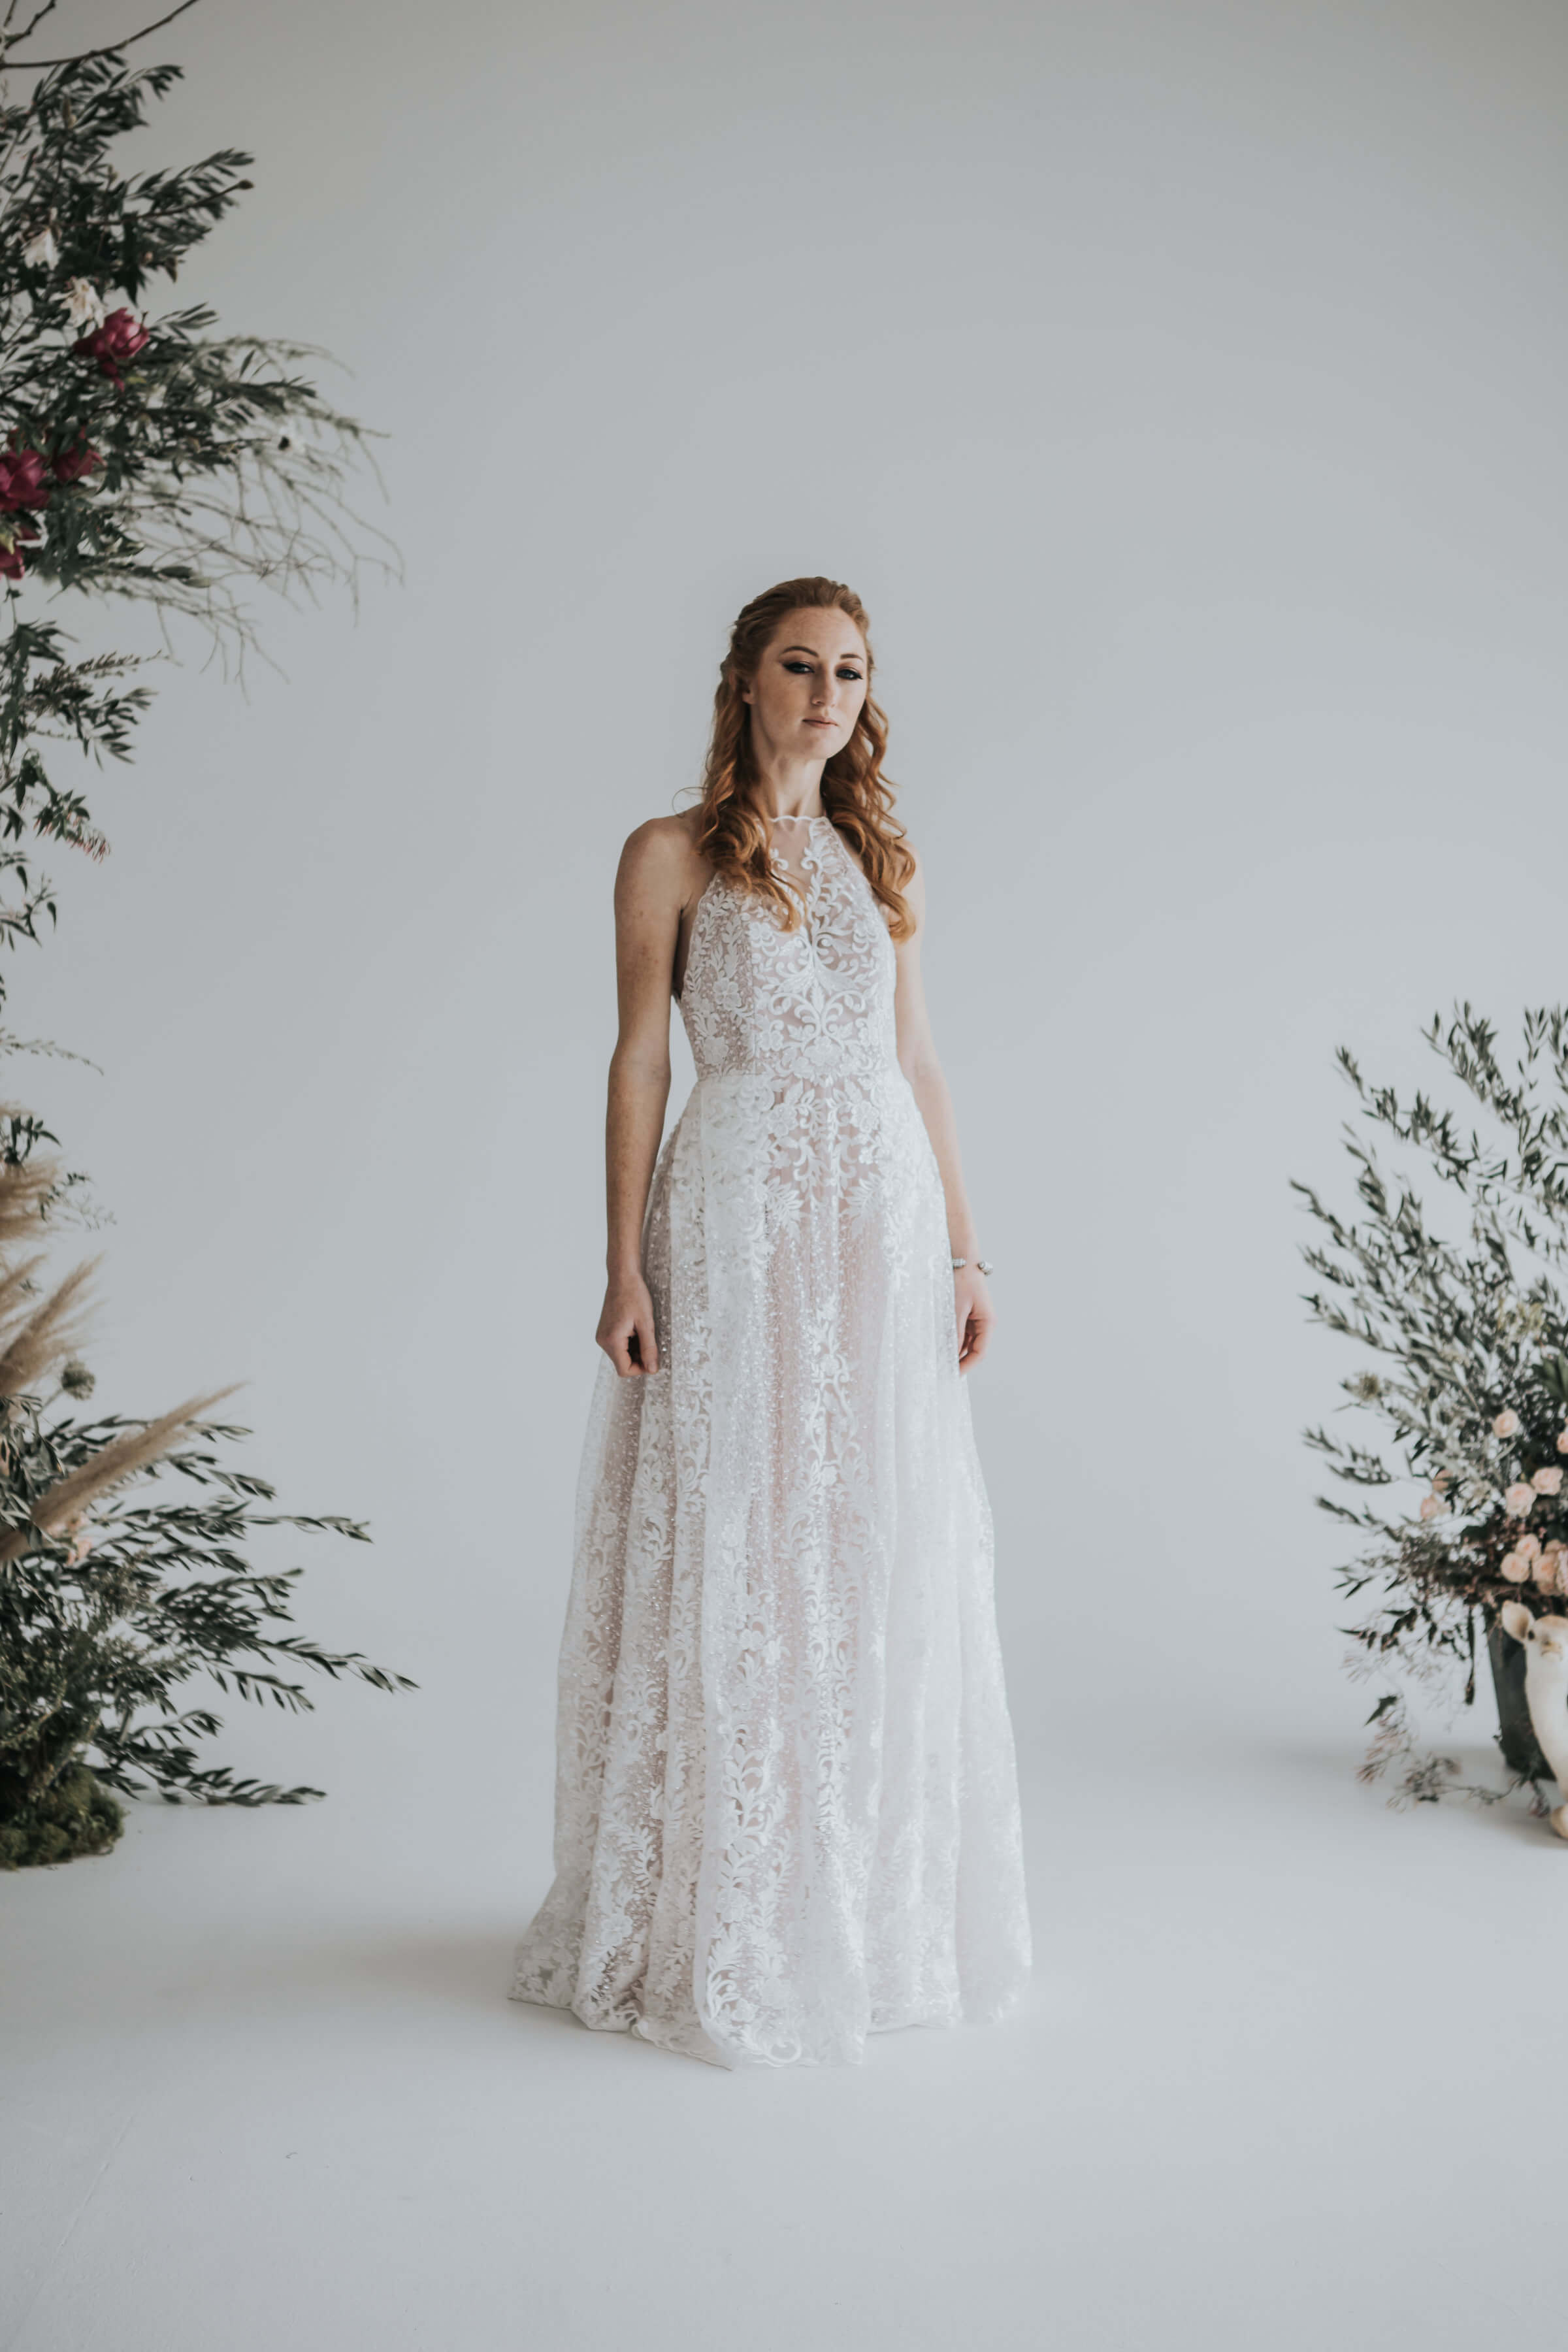 elizabeth_may_bridal_sujata.jpg